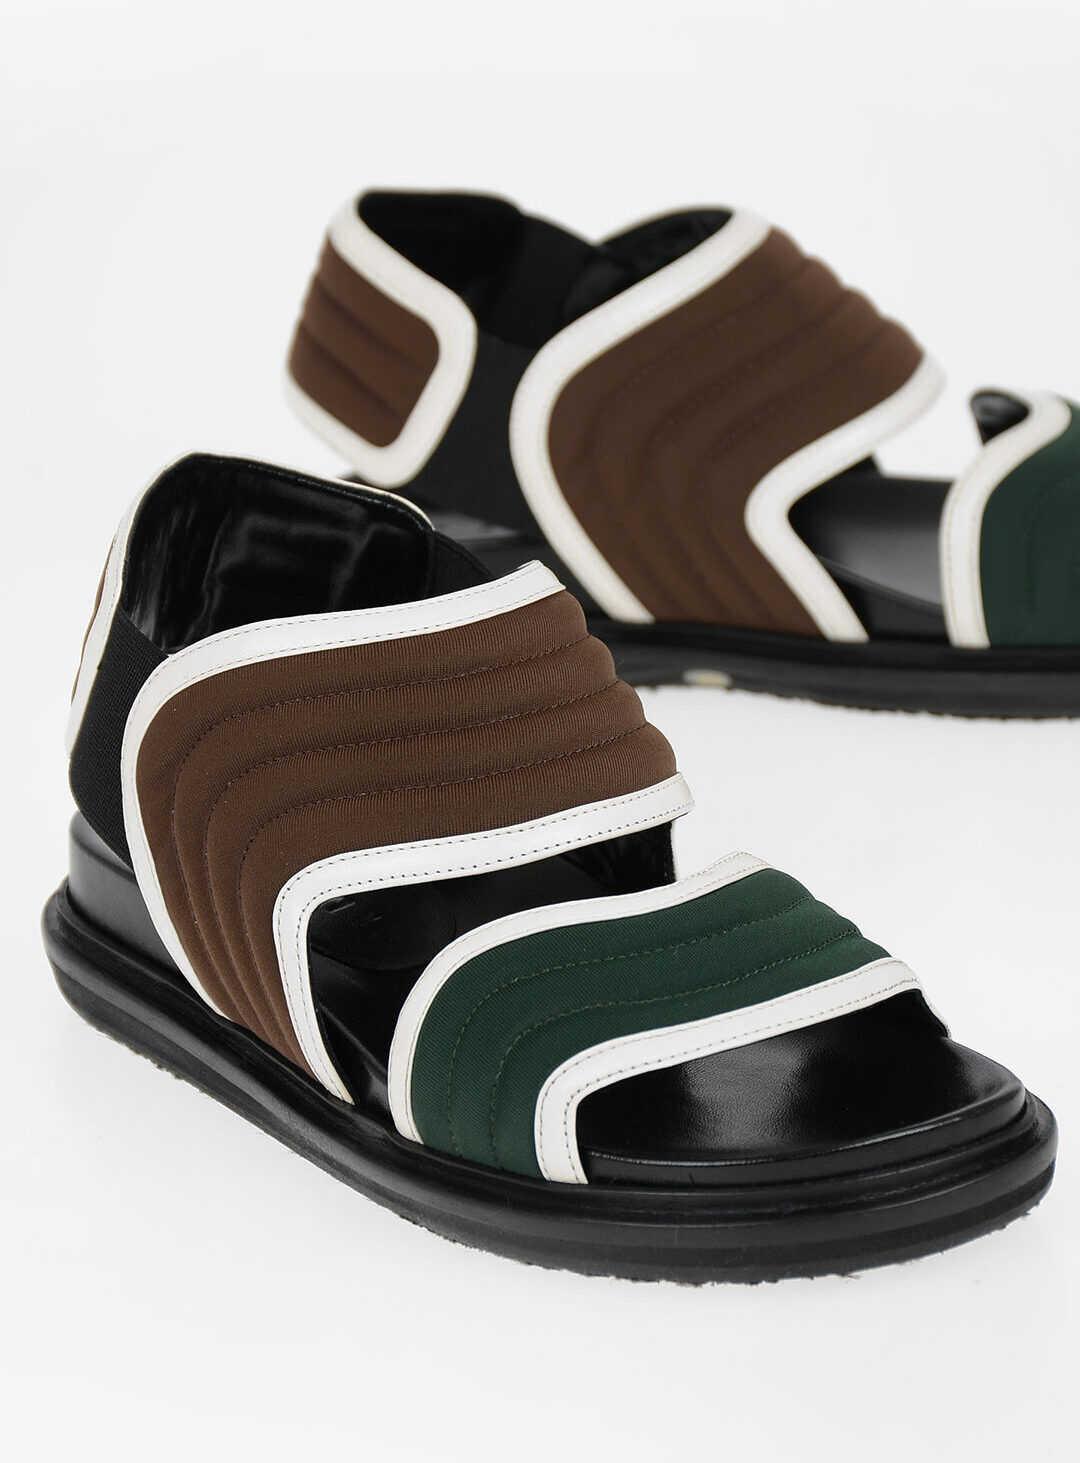 Marni Stretchy Fabric Sandals BROWN imagine b-mall.ro